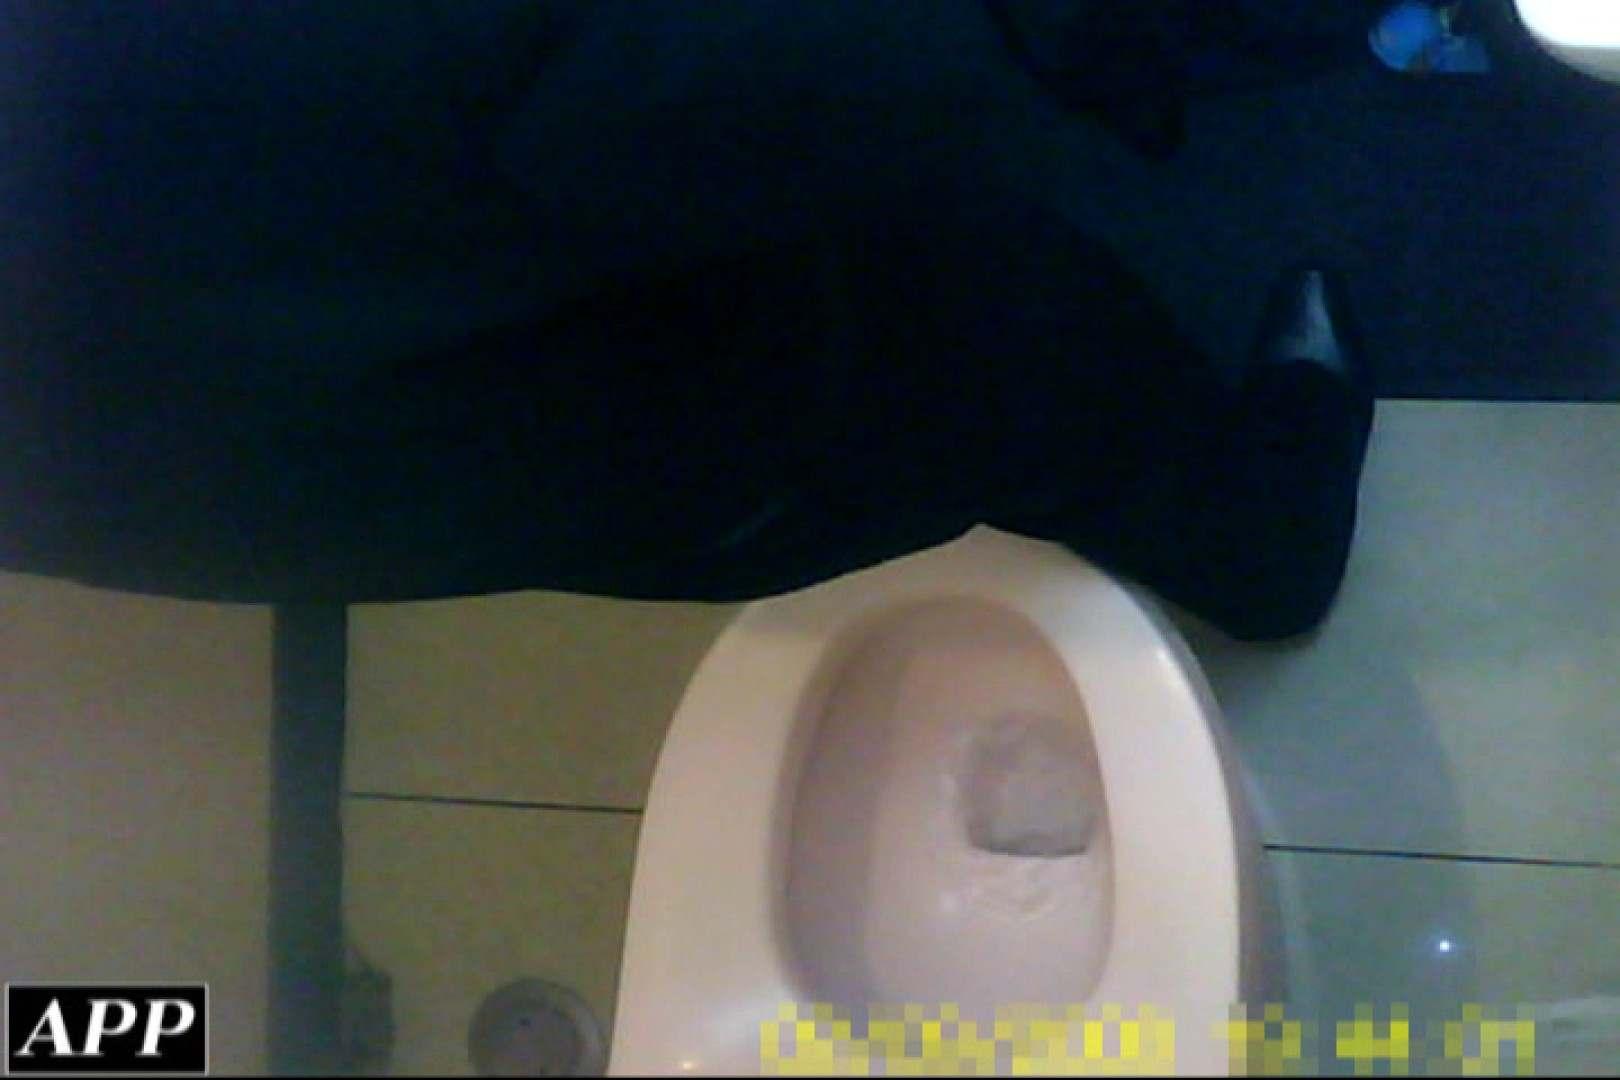 3視点洗面所 vol.076 OLセックス | 洗面所  74画像 37